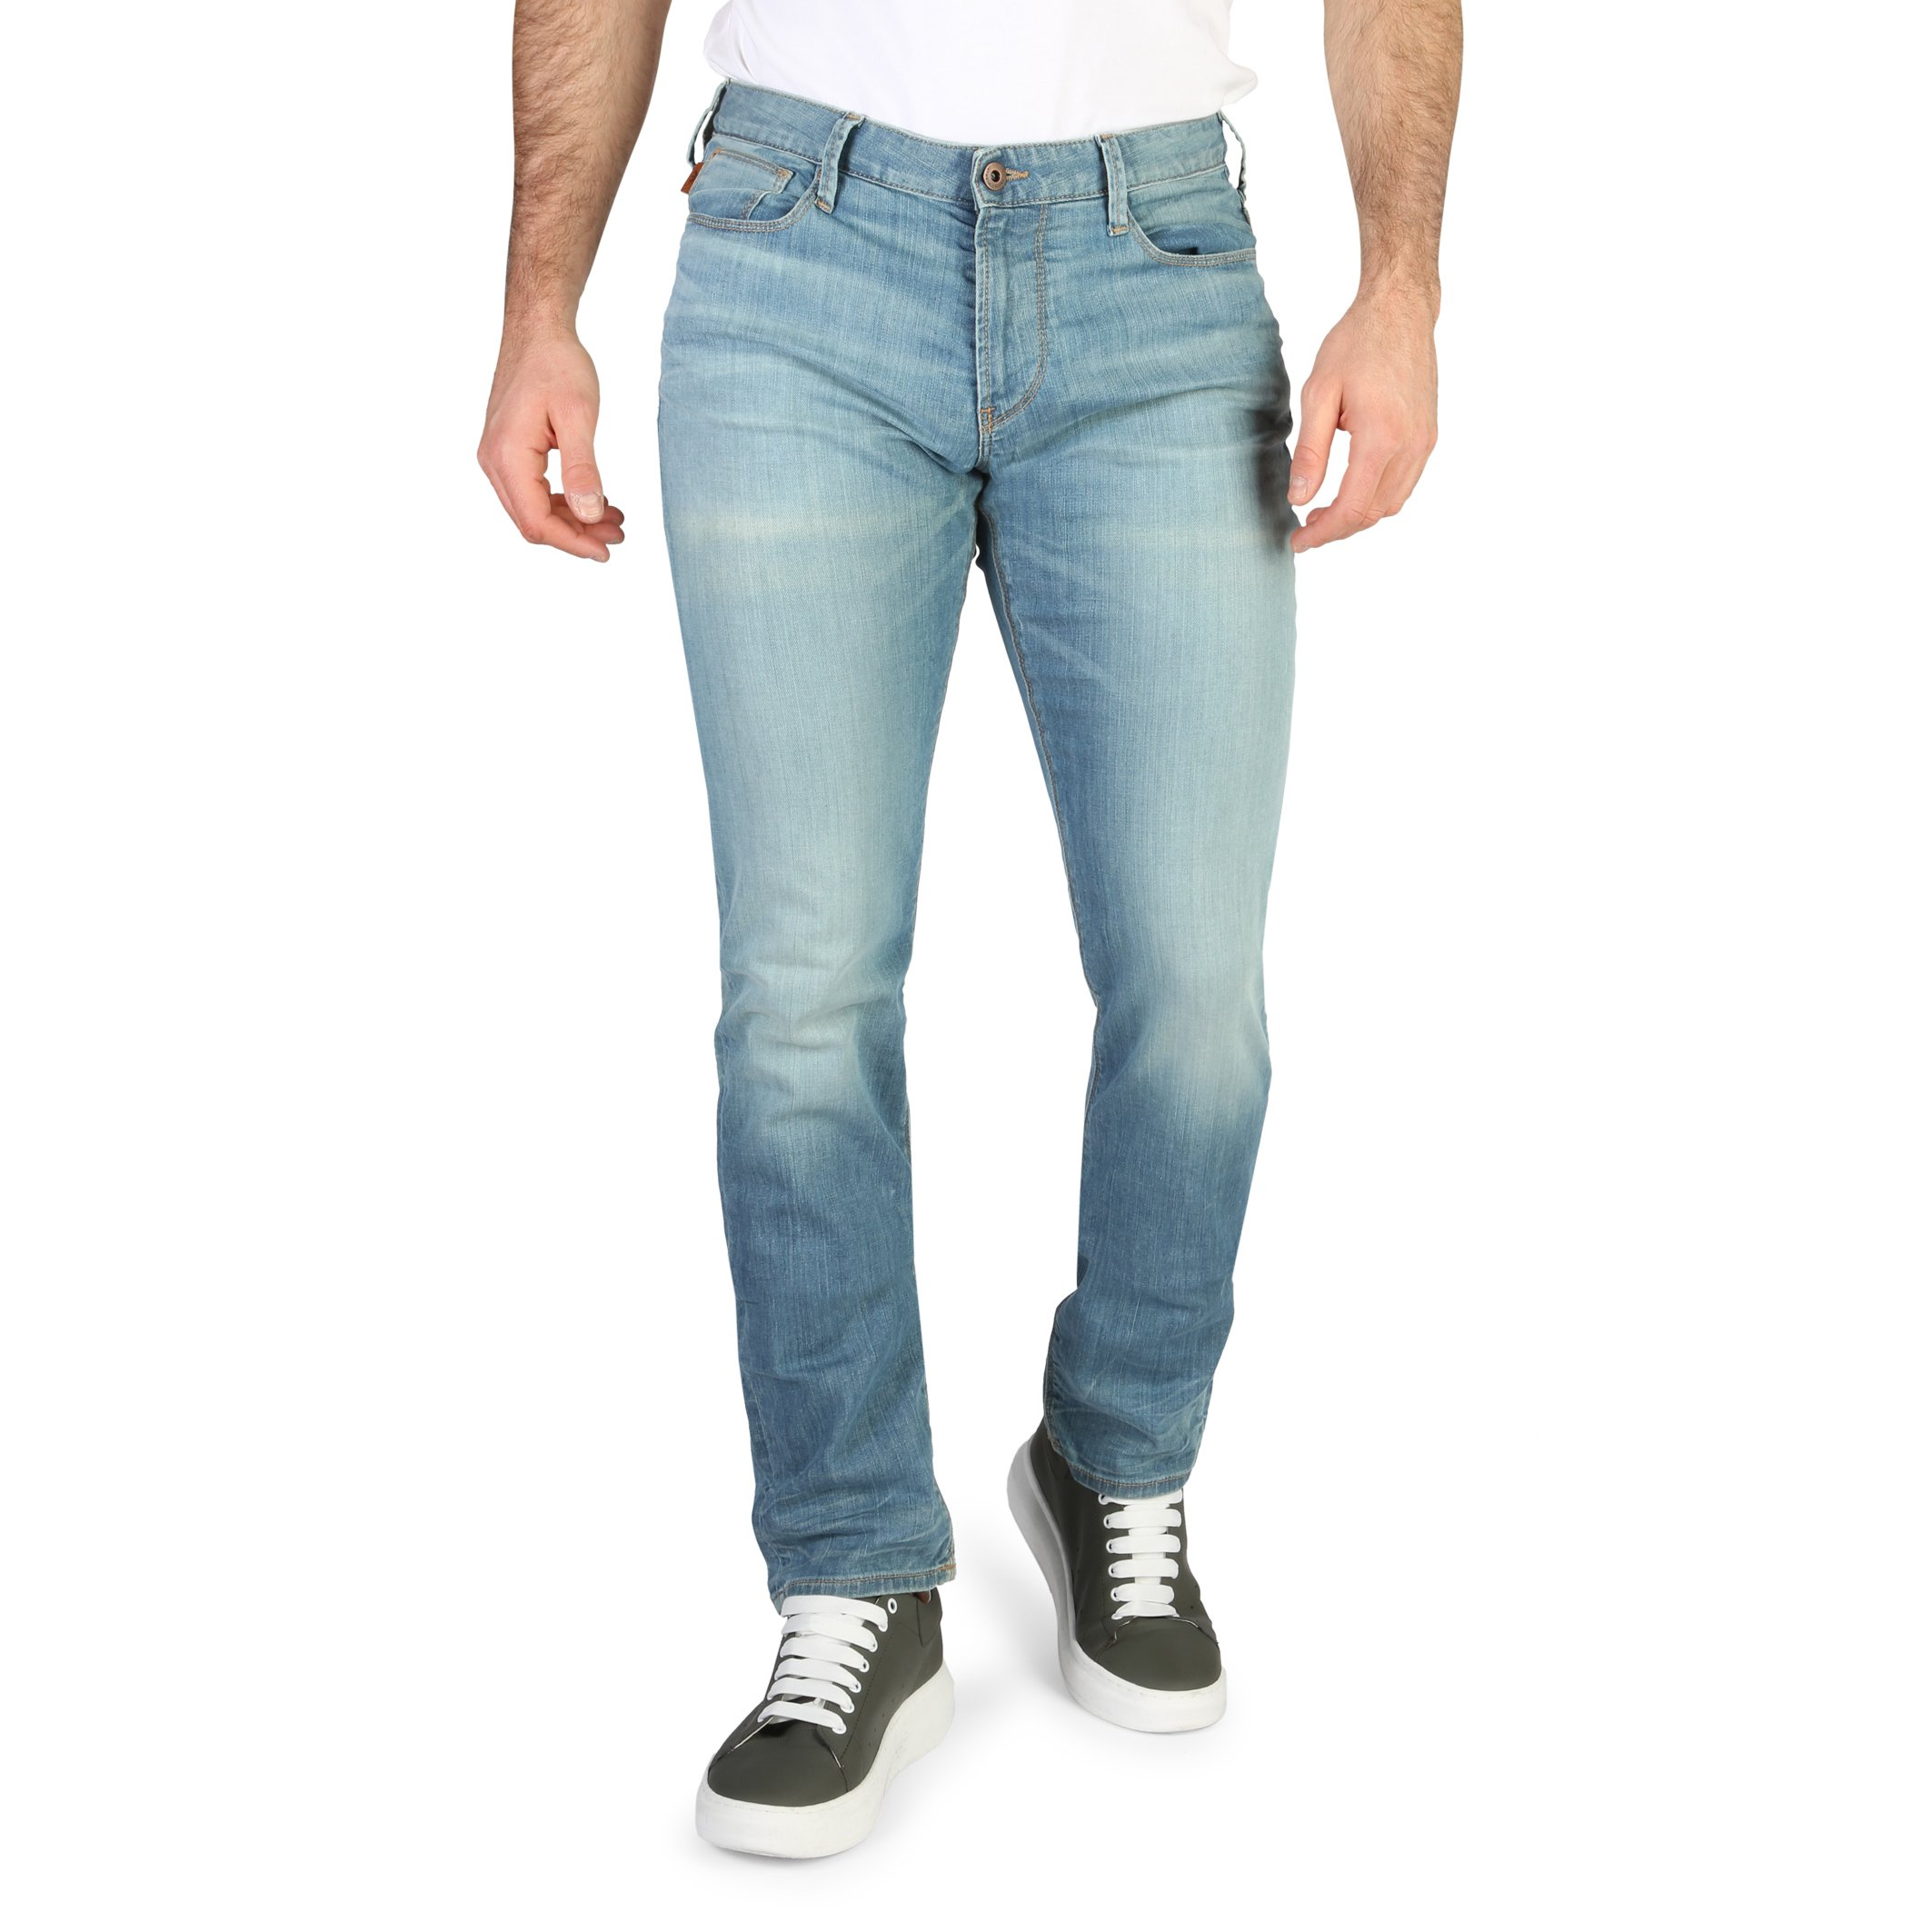 Emporio Armani Men's Jeans Blue 330055 - blue-3 32